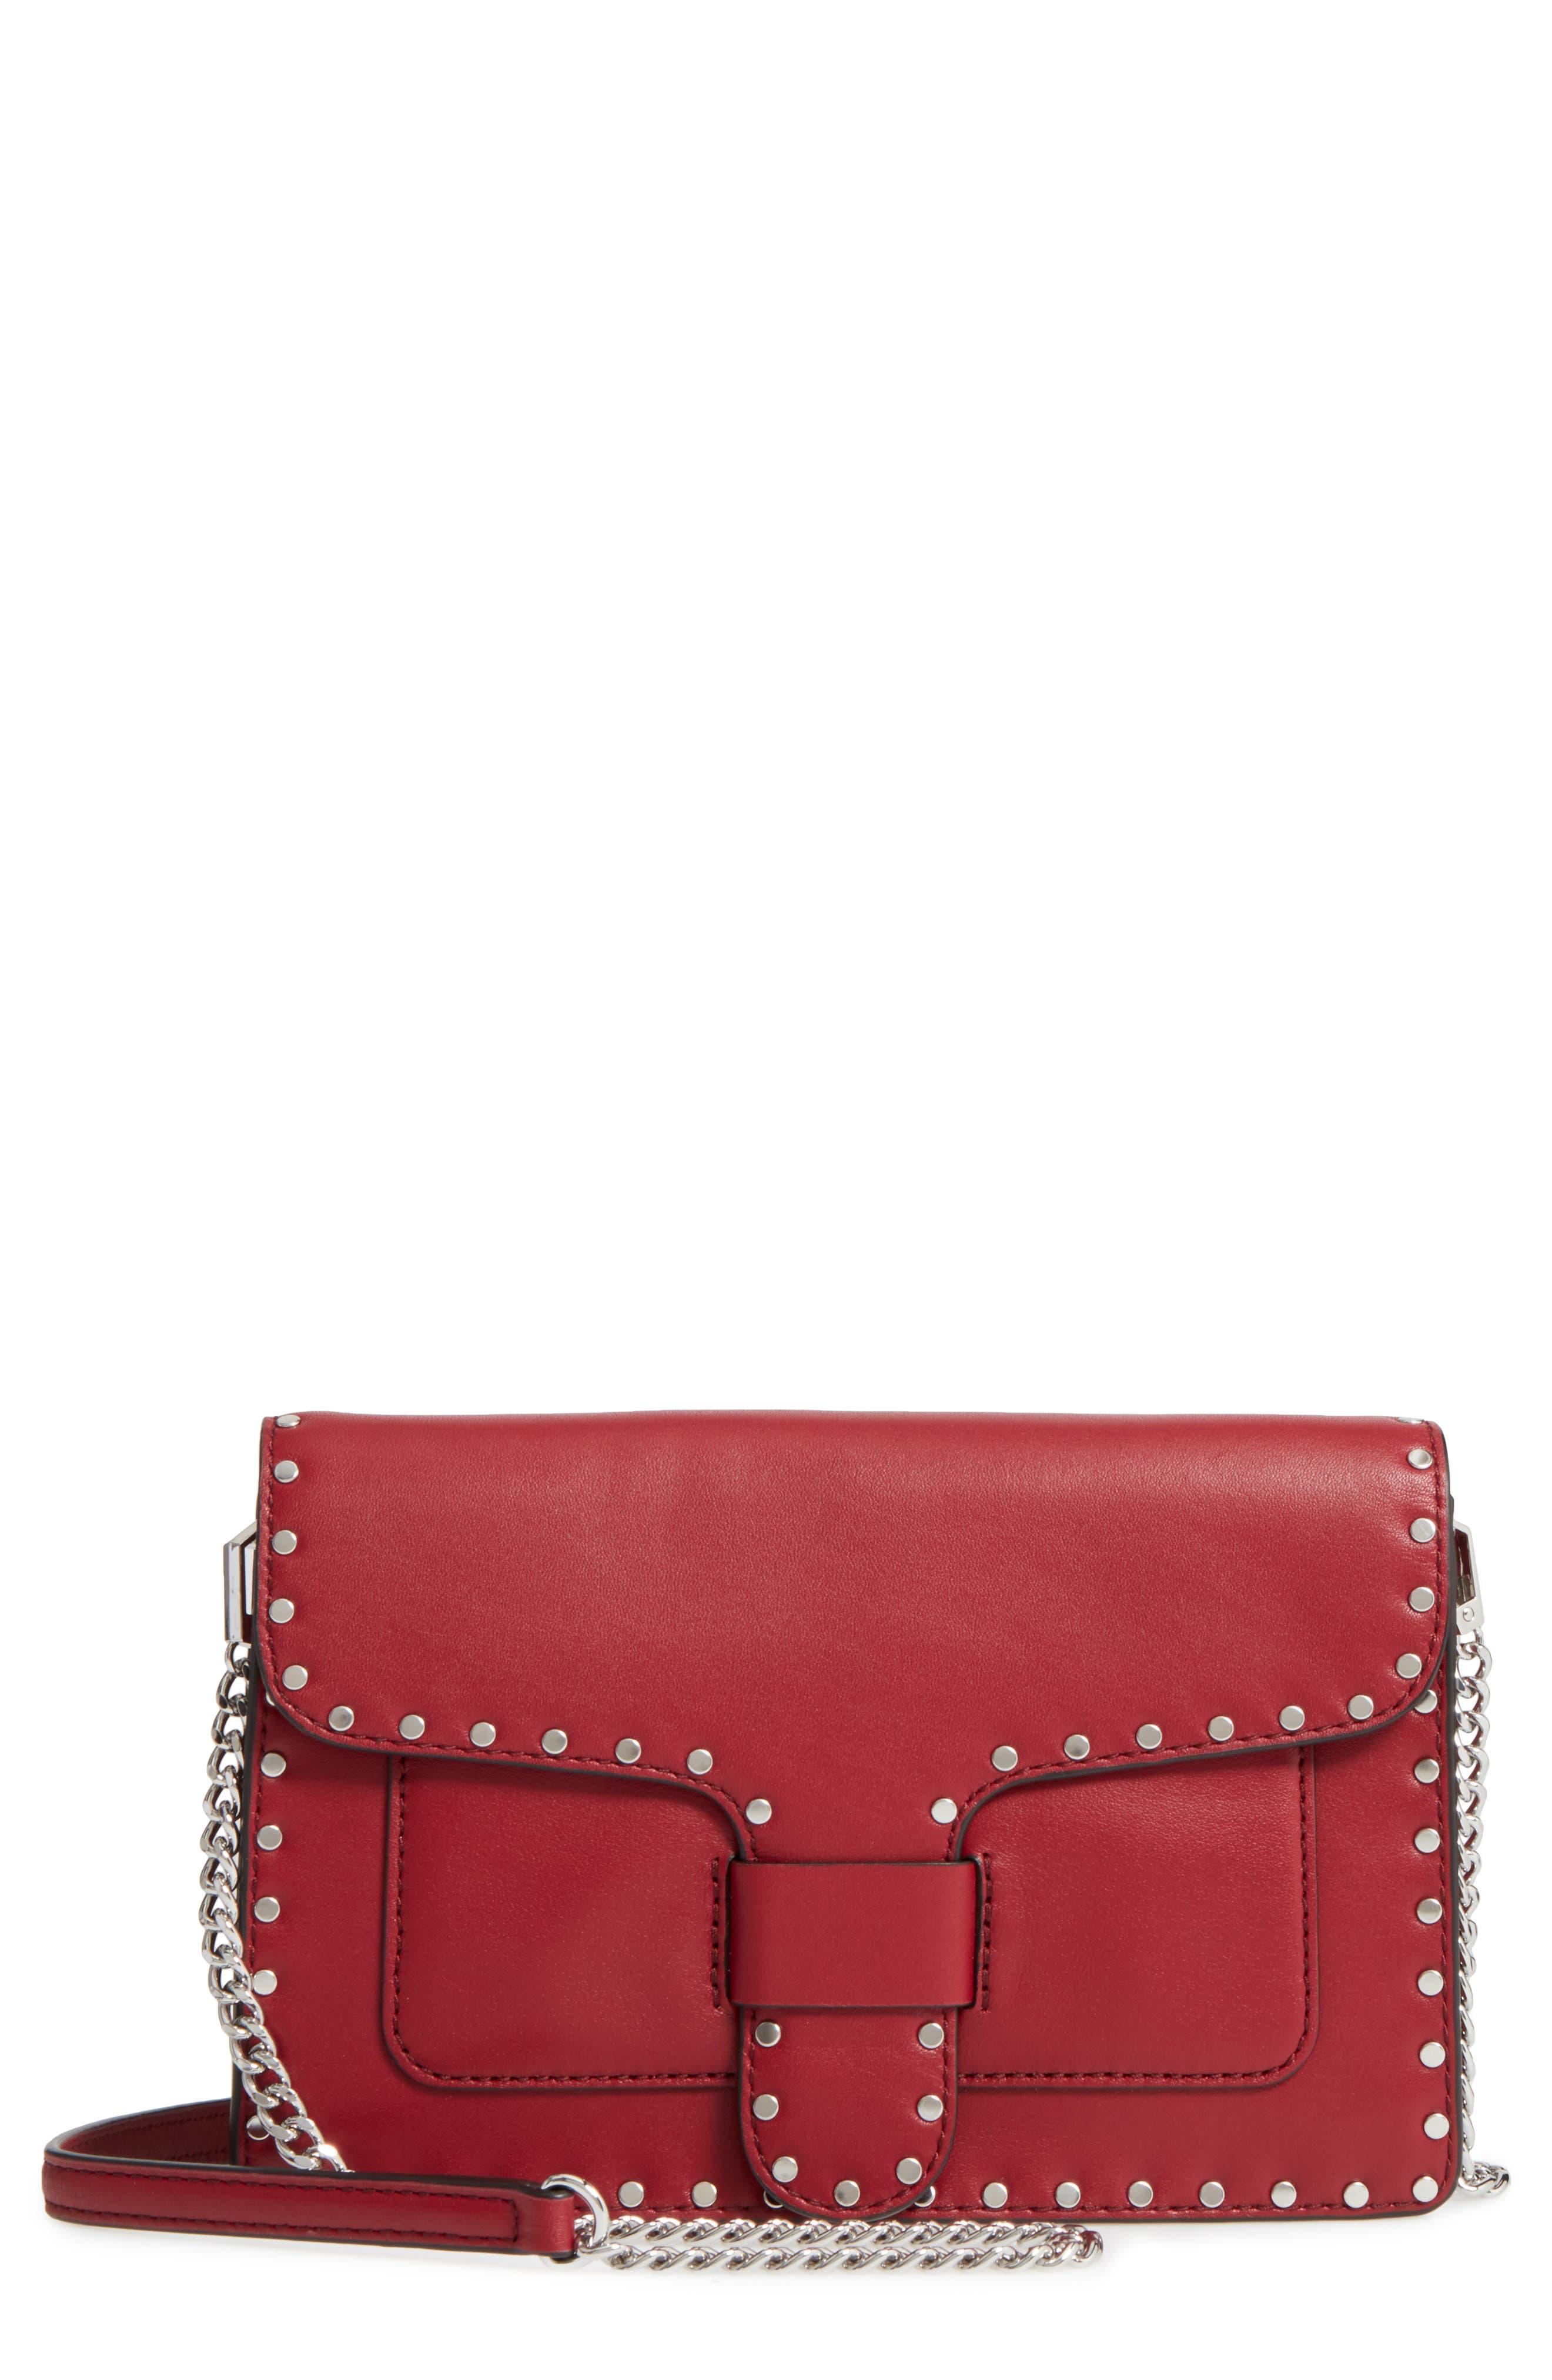 REBECCA MINKOFF Medium Midnighter Leather Crossbody Bag